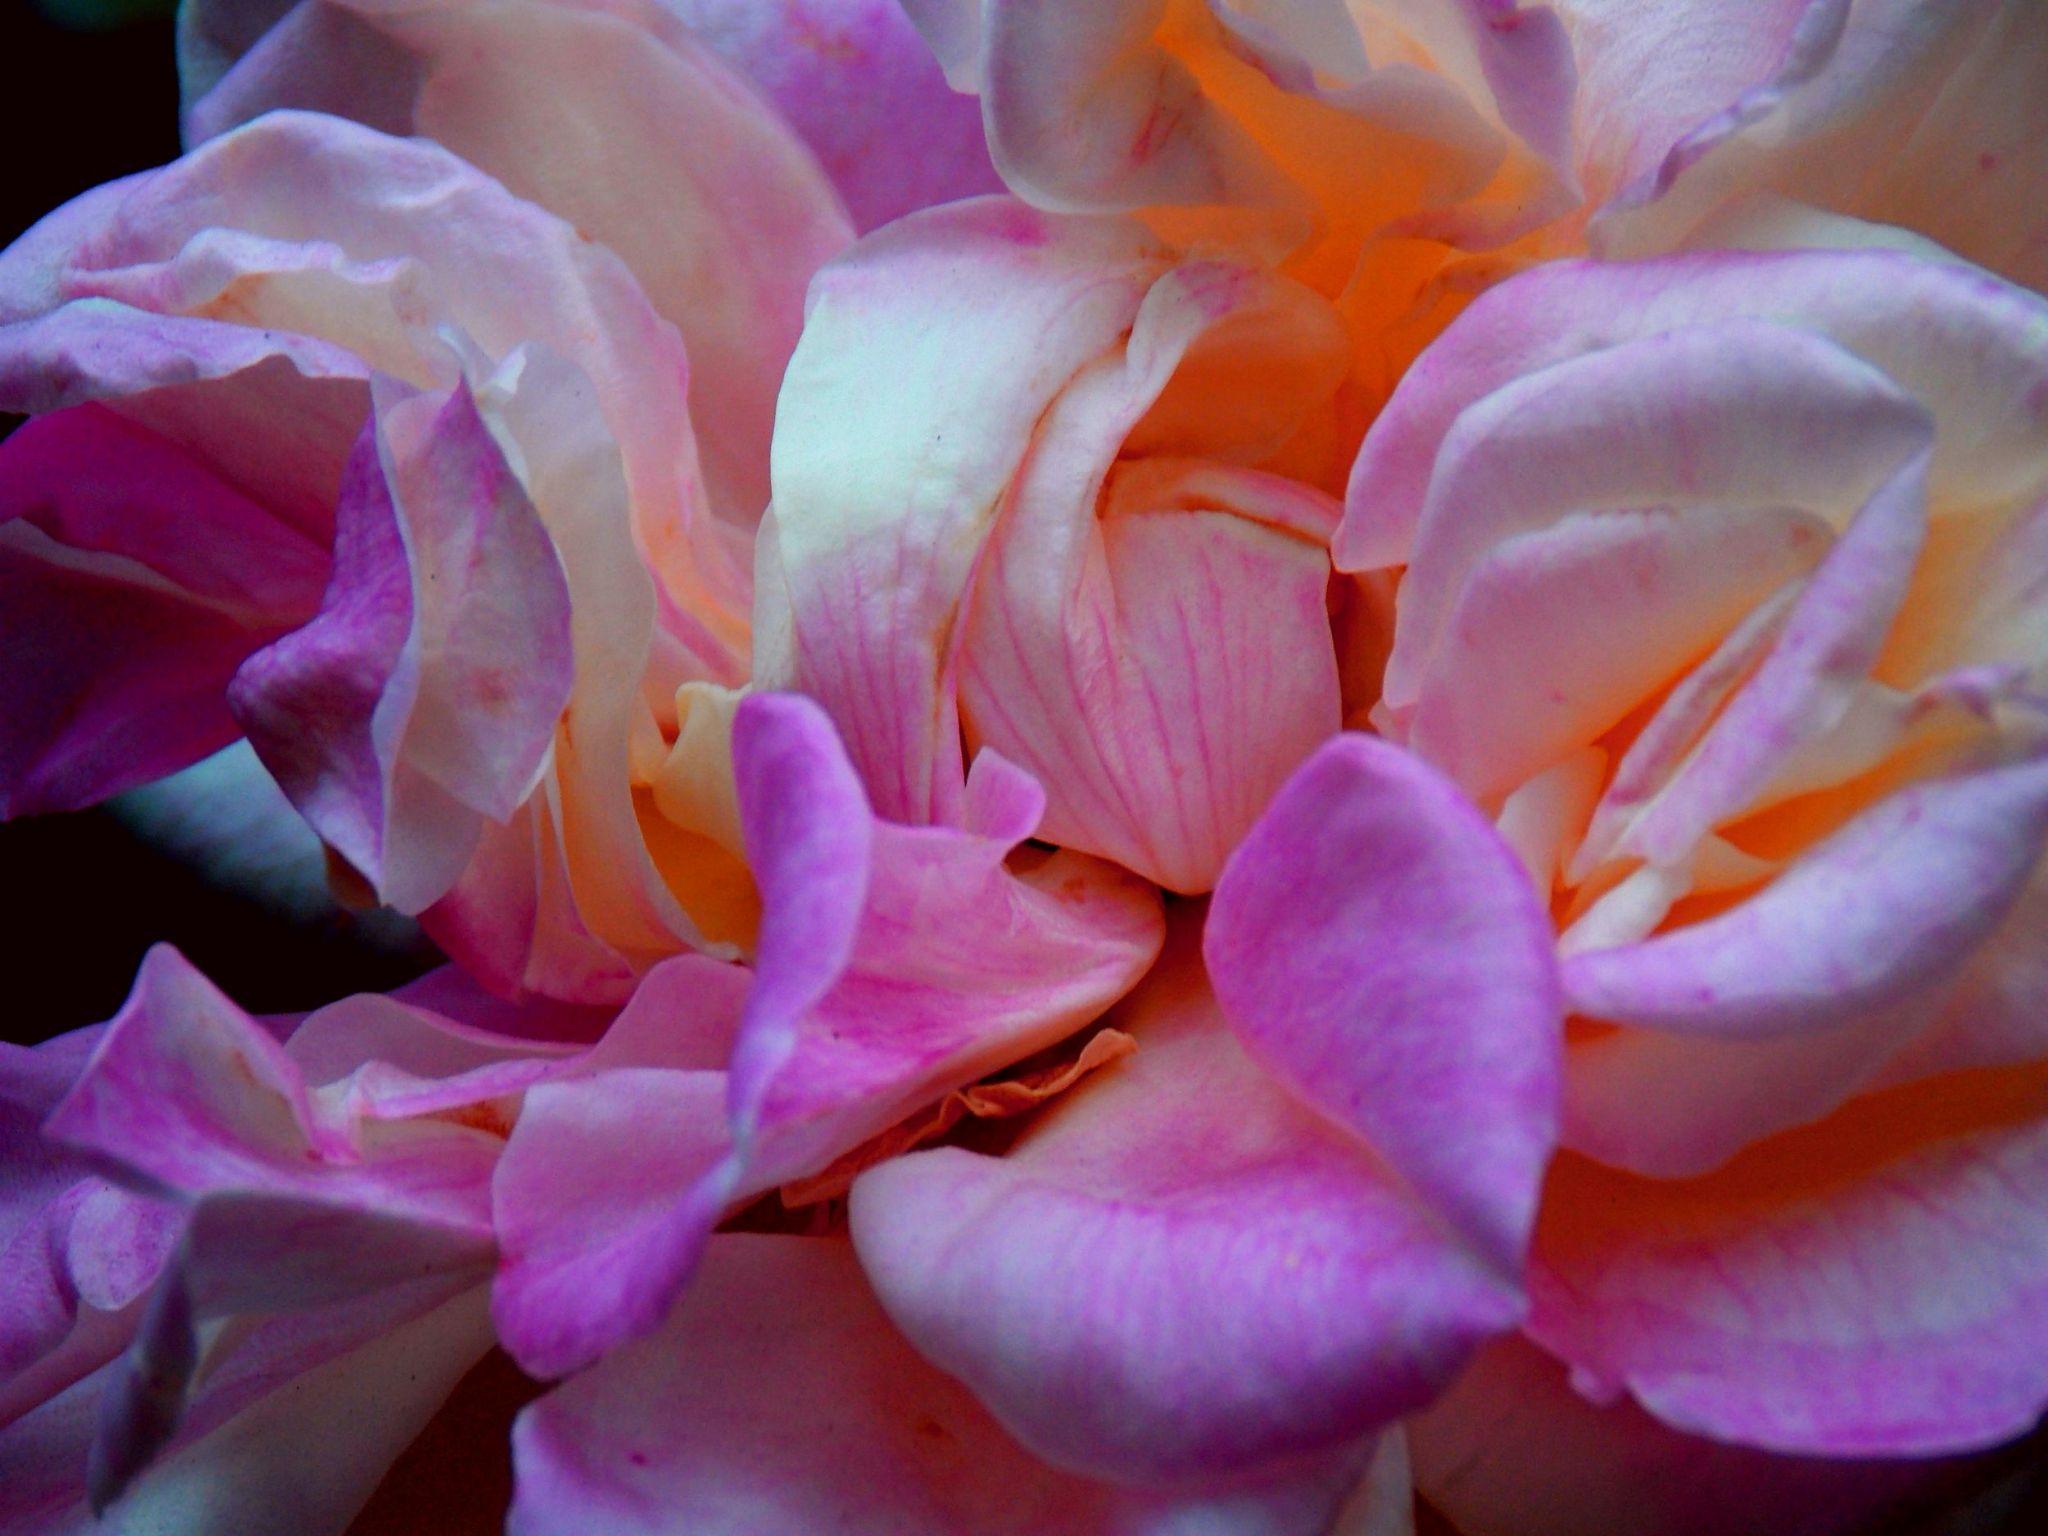 Rose by Amanda Reis Romero